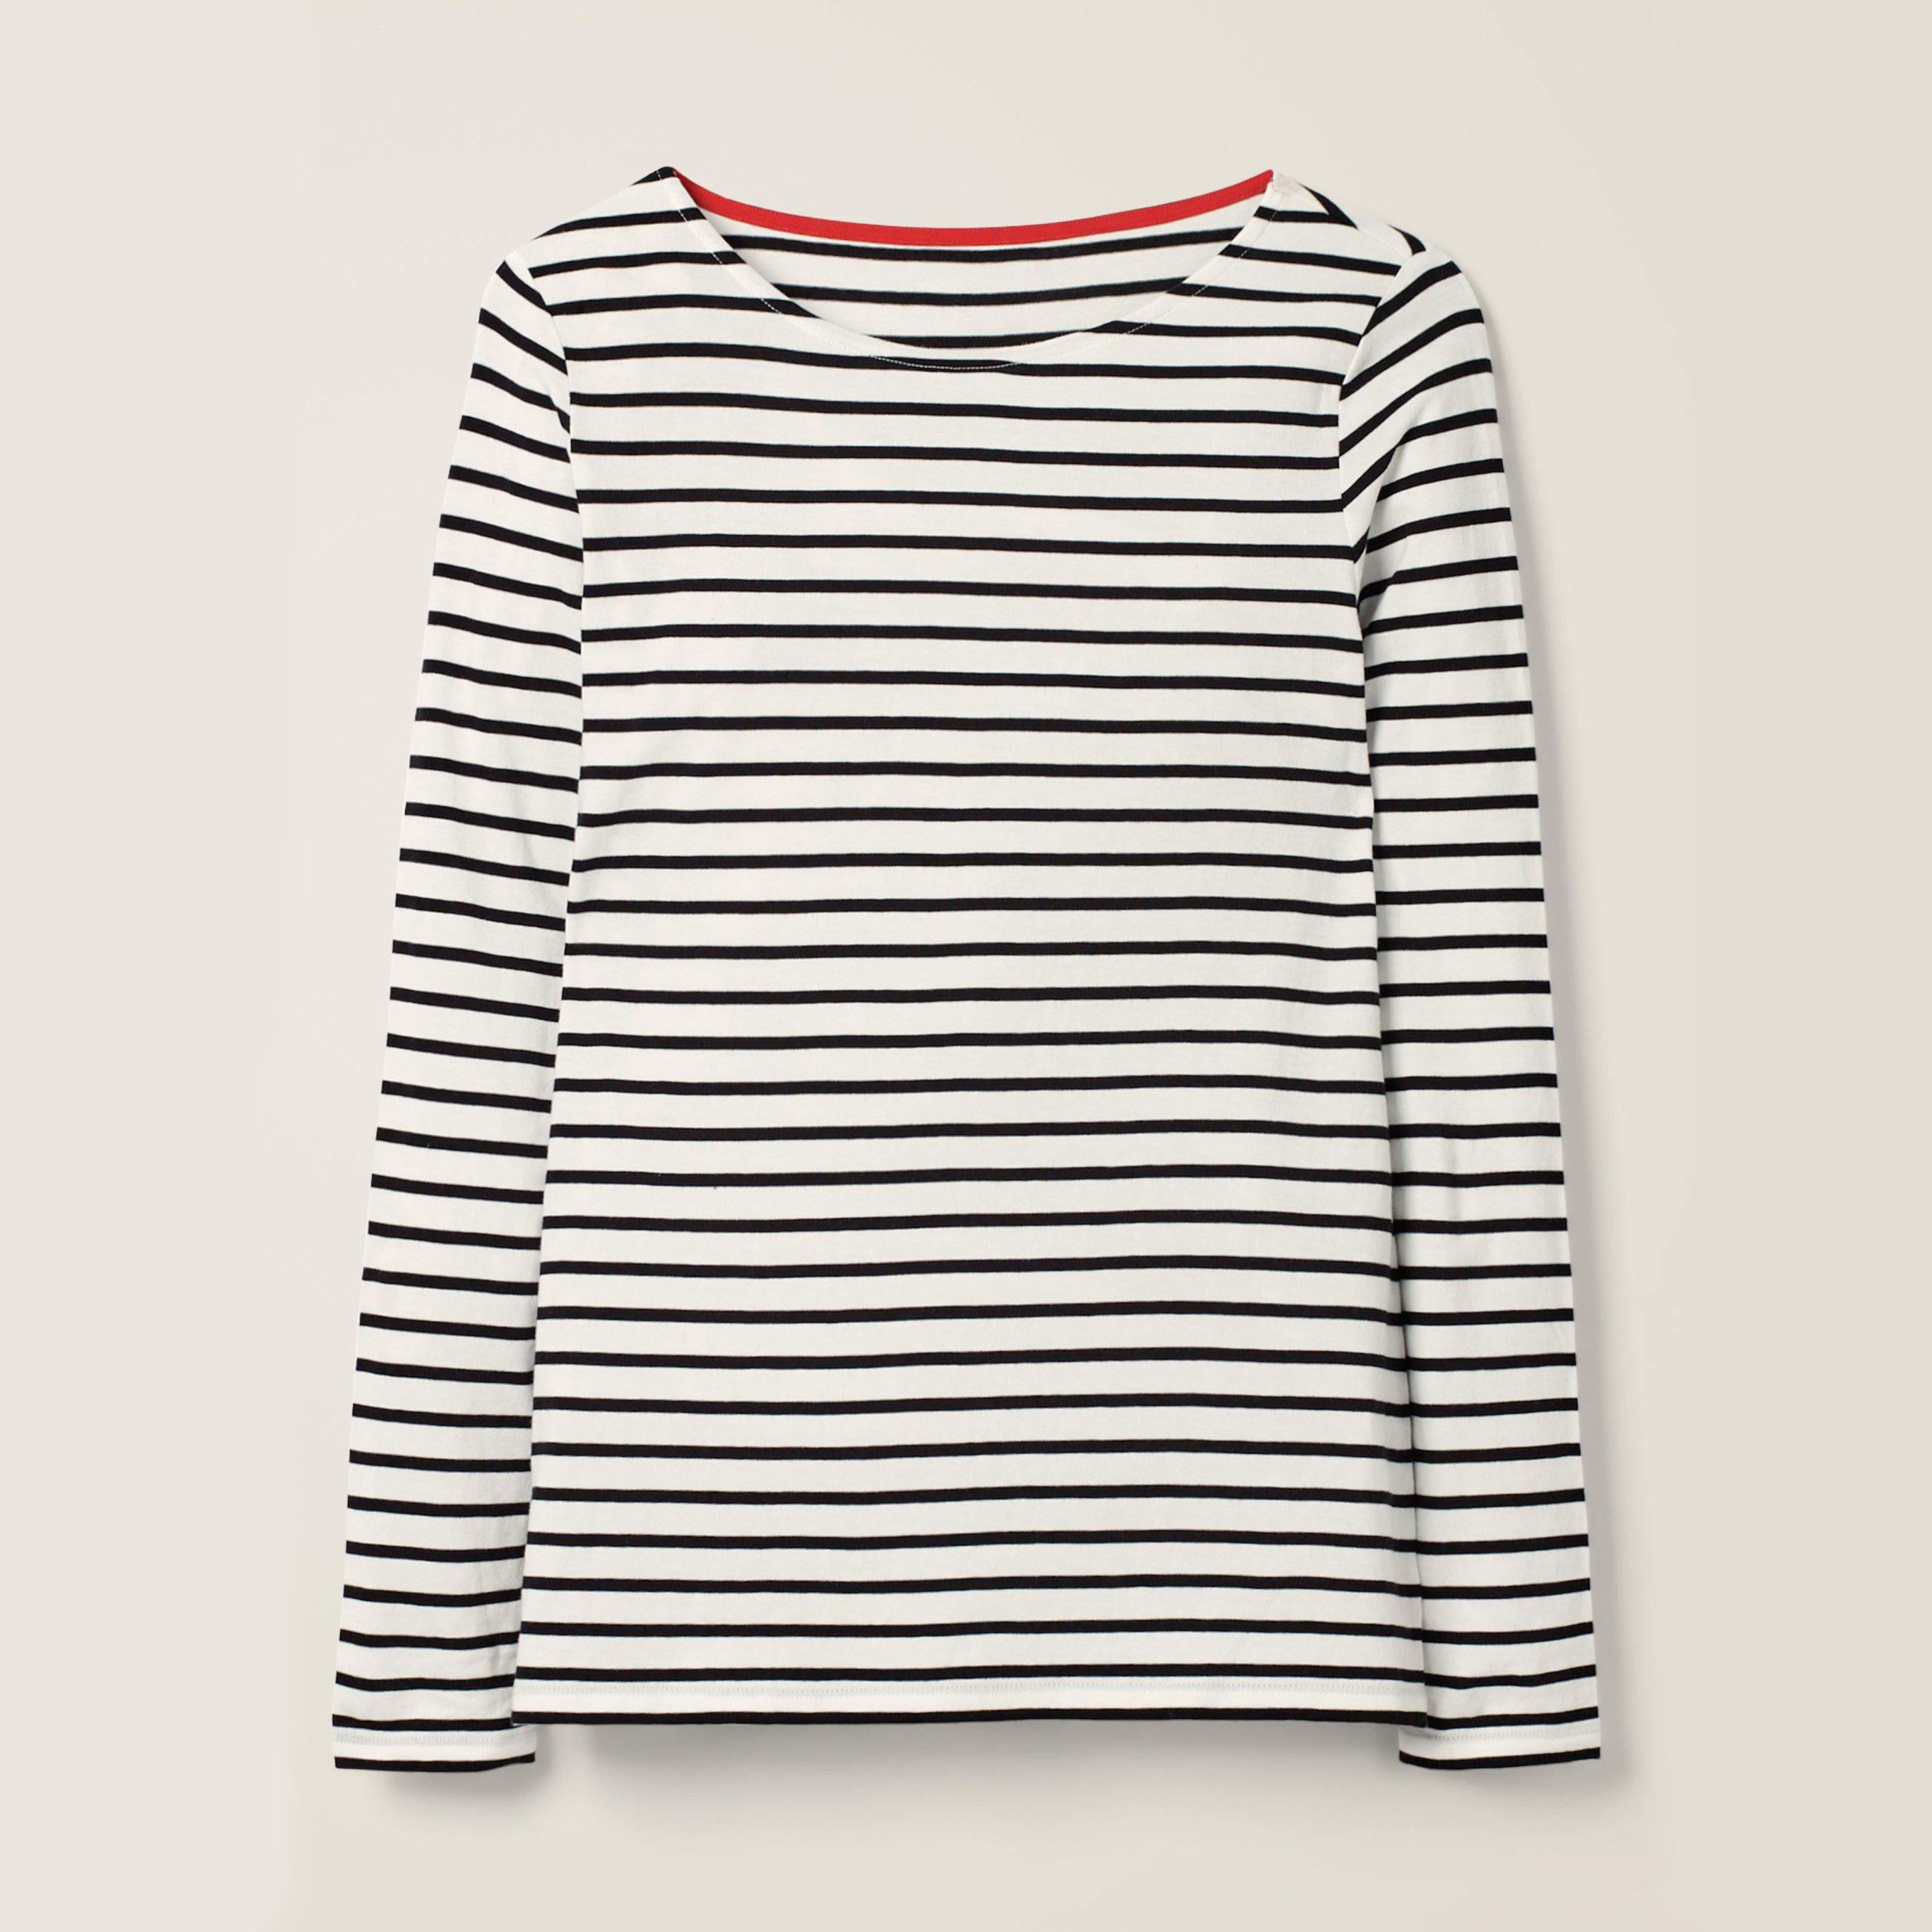 Breton from Boden shirt